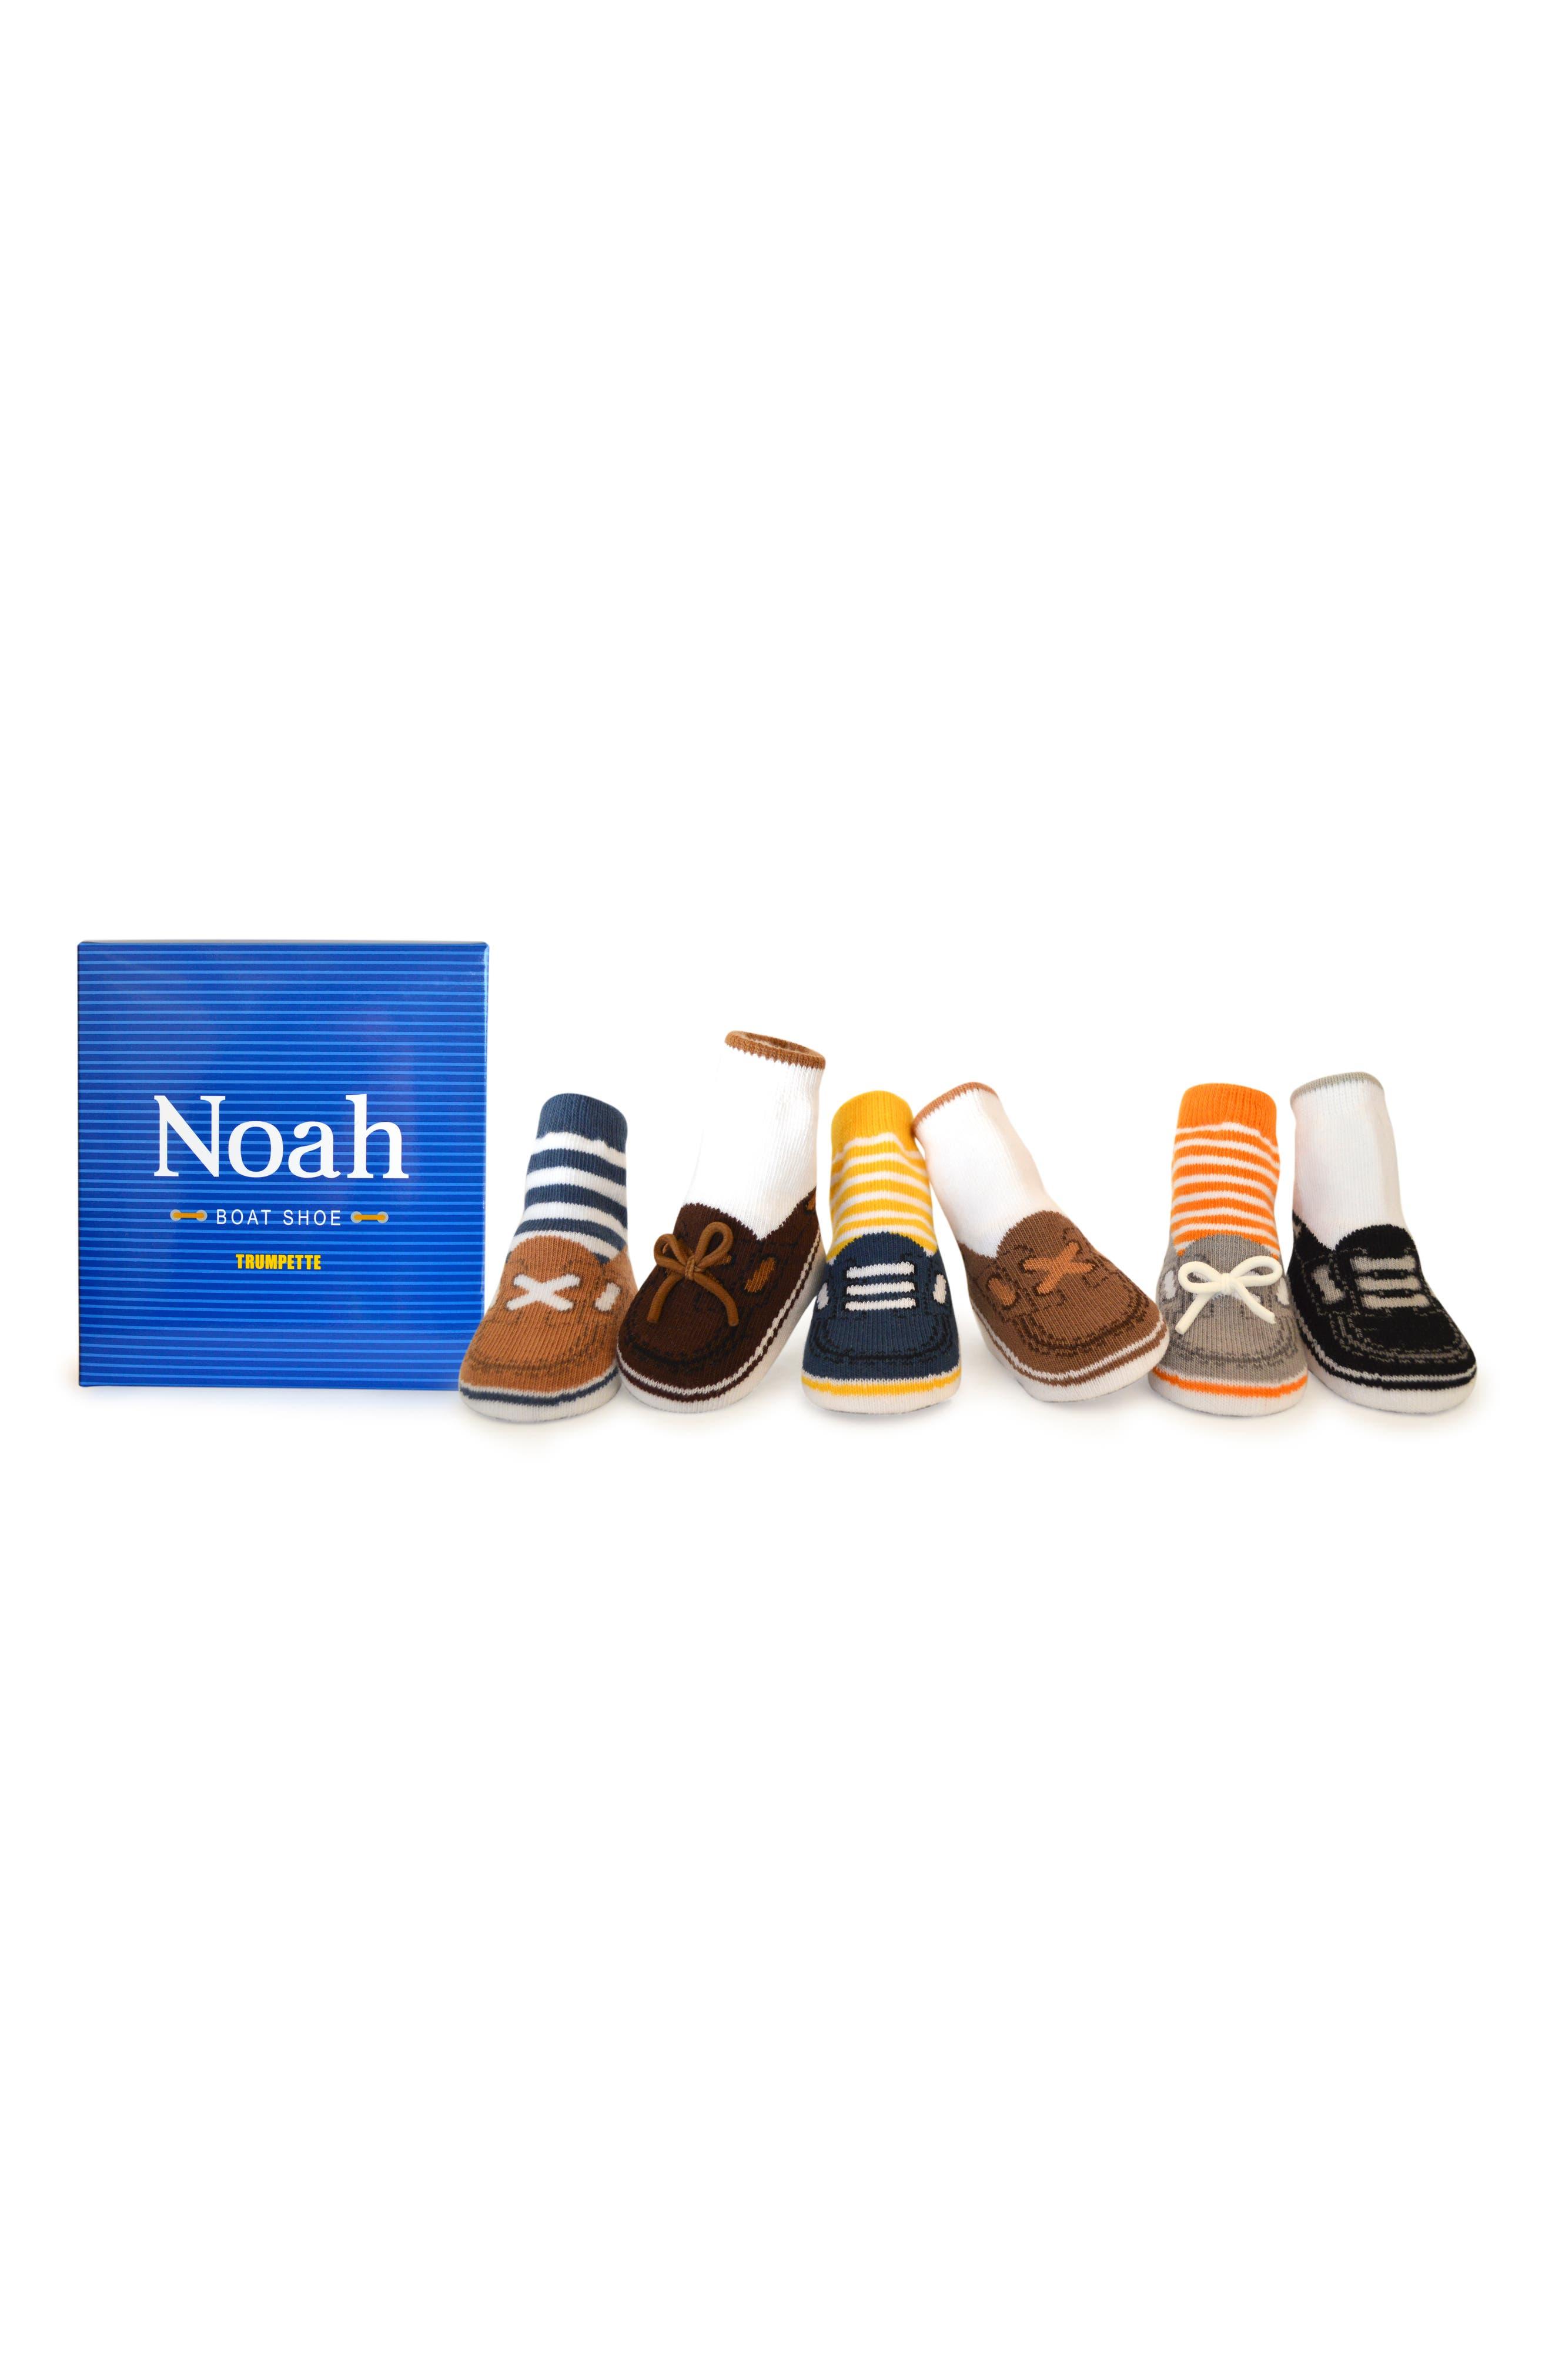 Noah 6-Pack Socks,                         Main,                         color, ASSORTED NEUTRAL